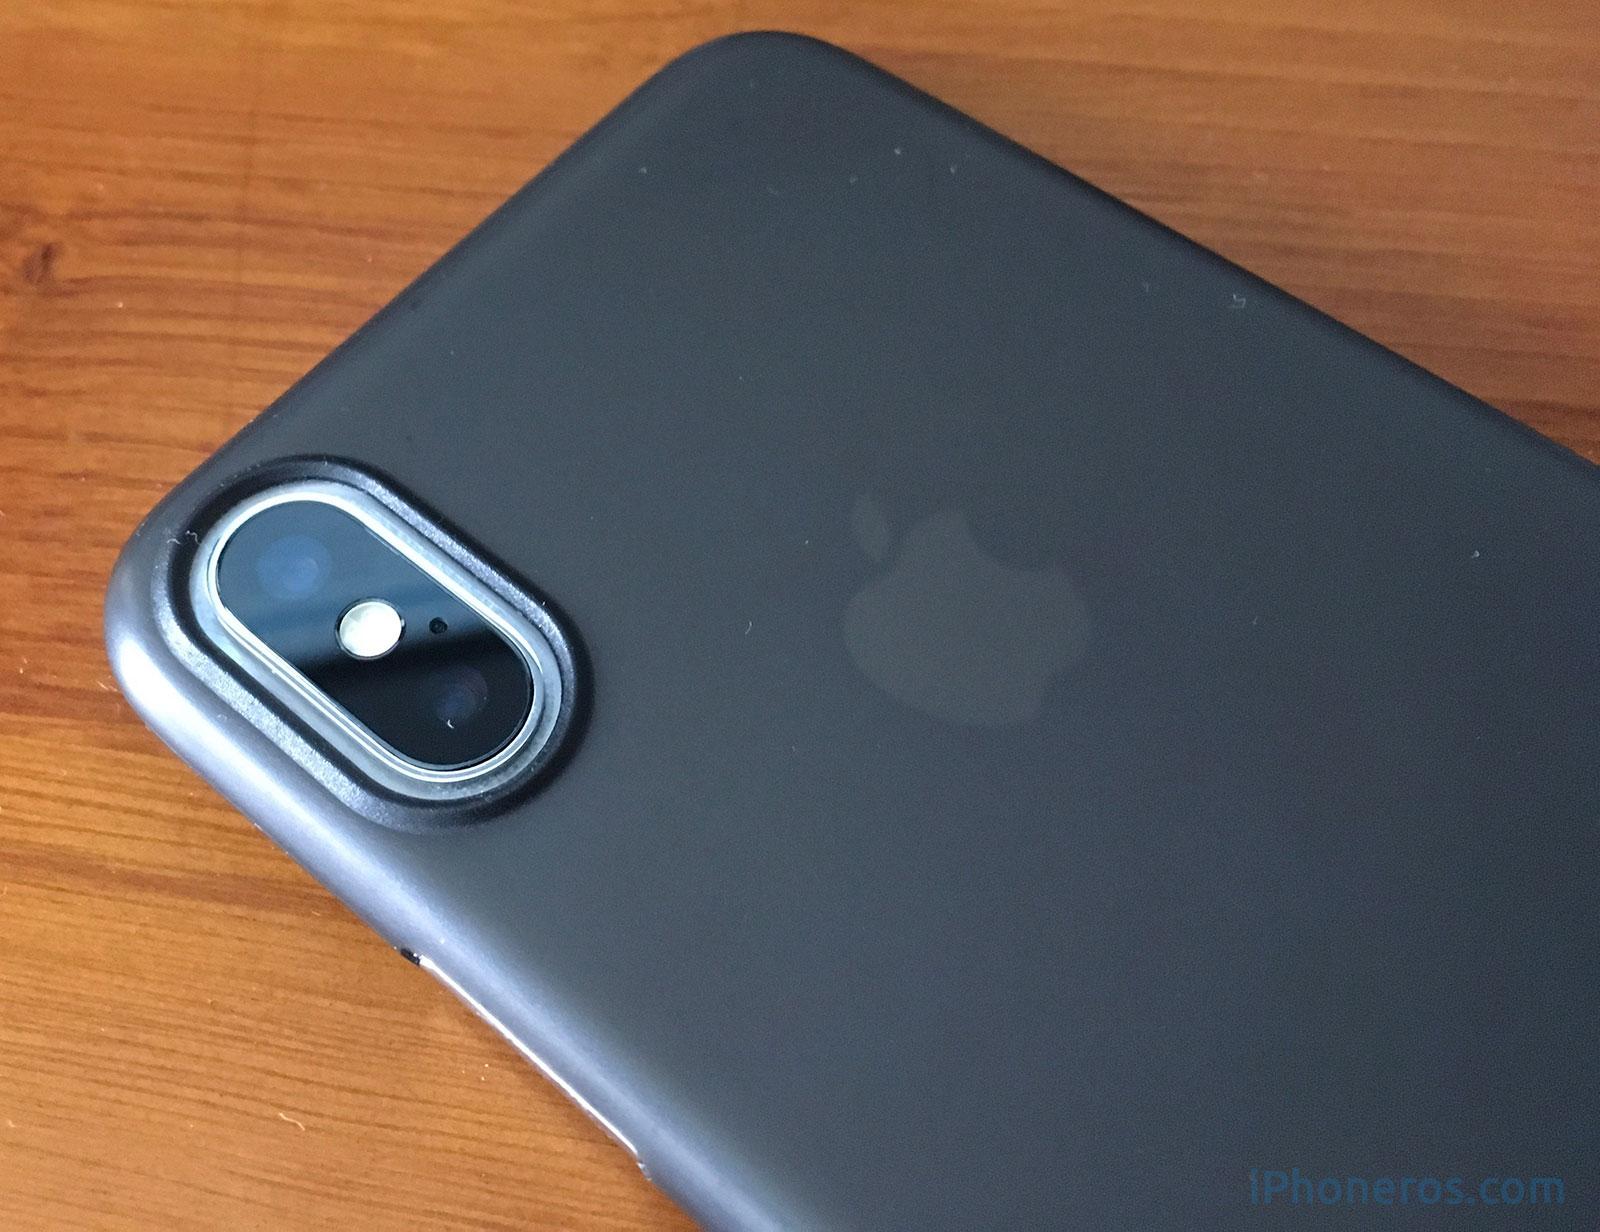 Cámara doble trasera del iPhone X